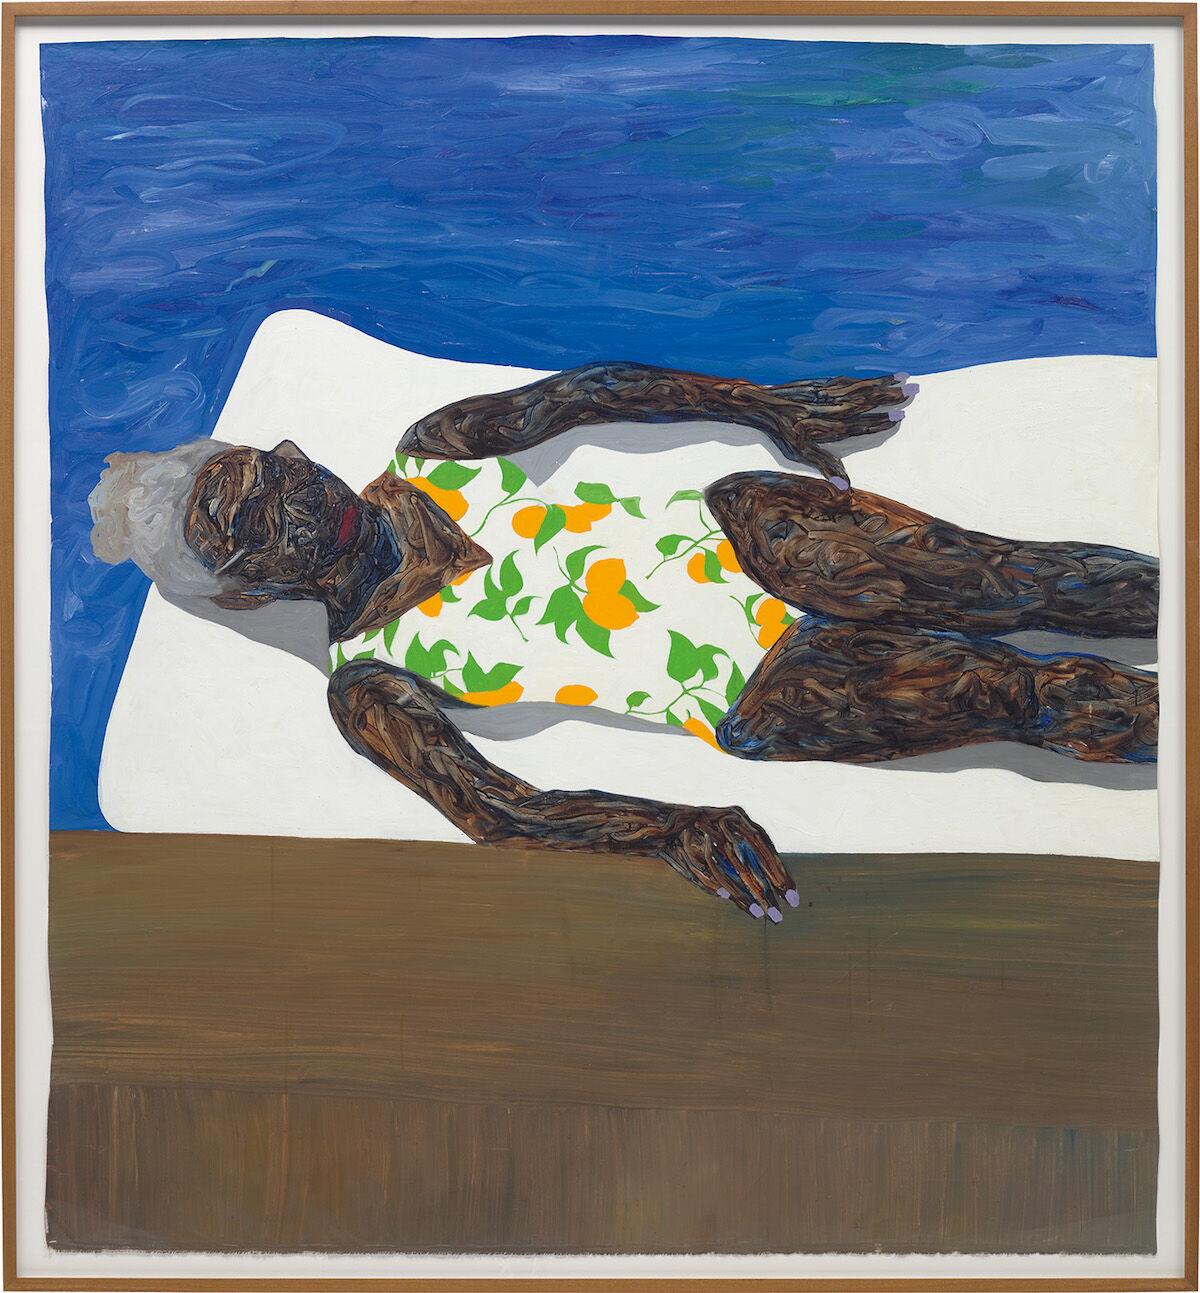 Amoako Boafo, The Lemon Bathing Suit, 2019. Sold for £675,000 ($875,000). Courtesy Phillips.